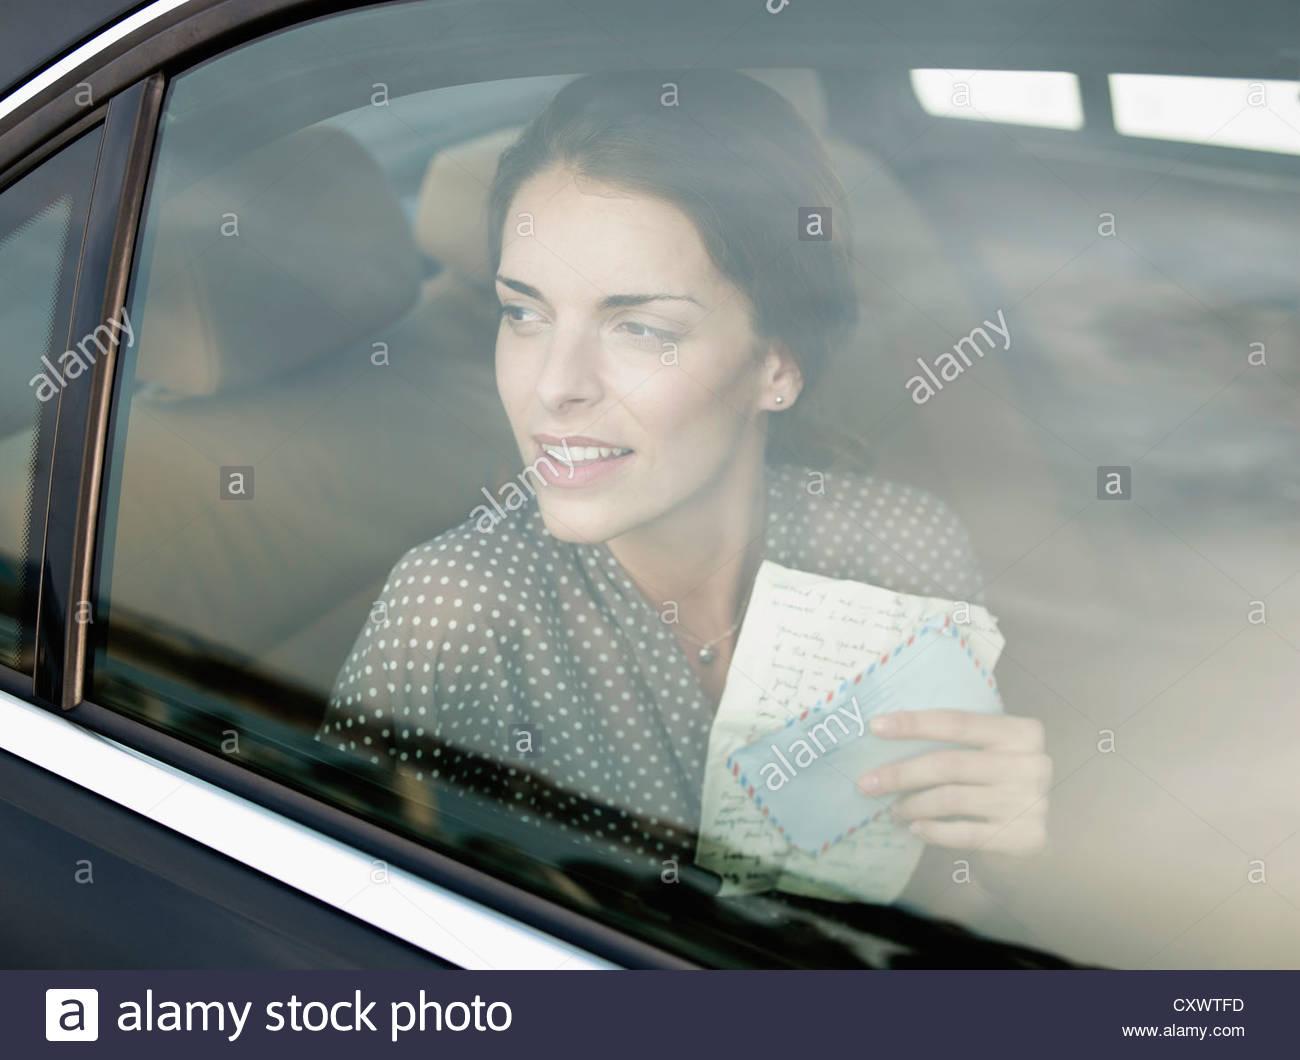 Frau mit Brief im Rücksitz des Autos Stockbild